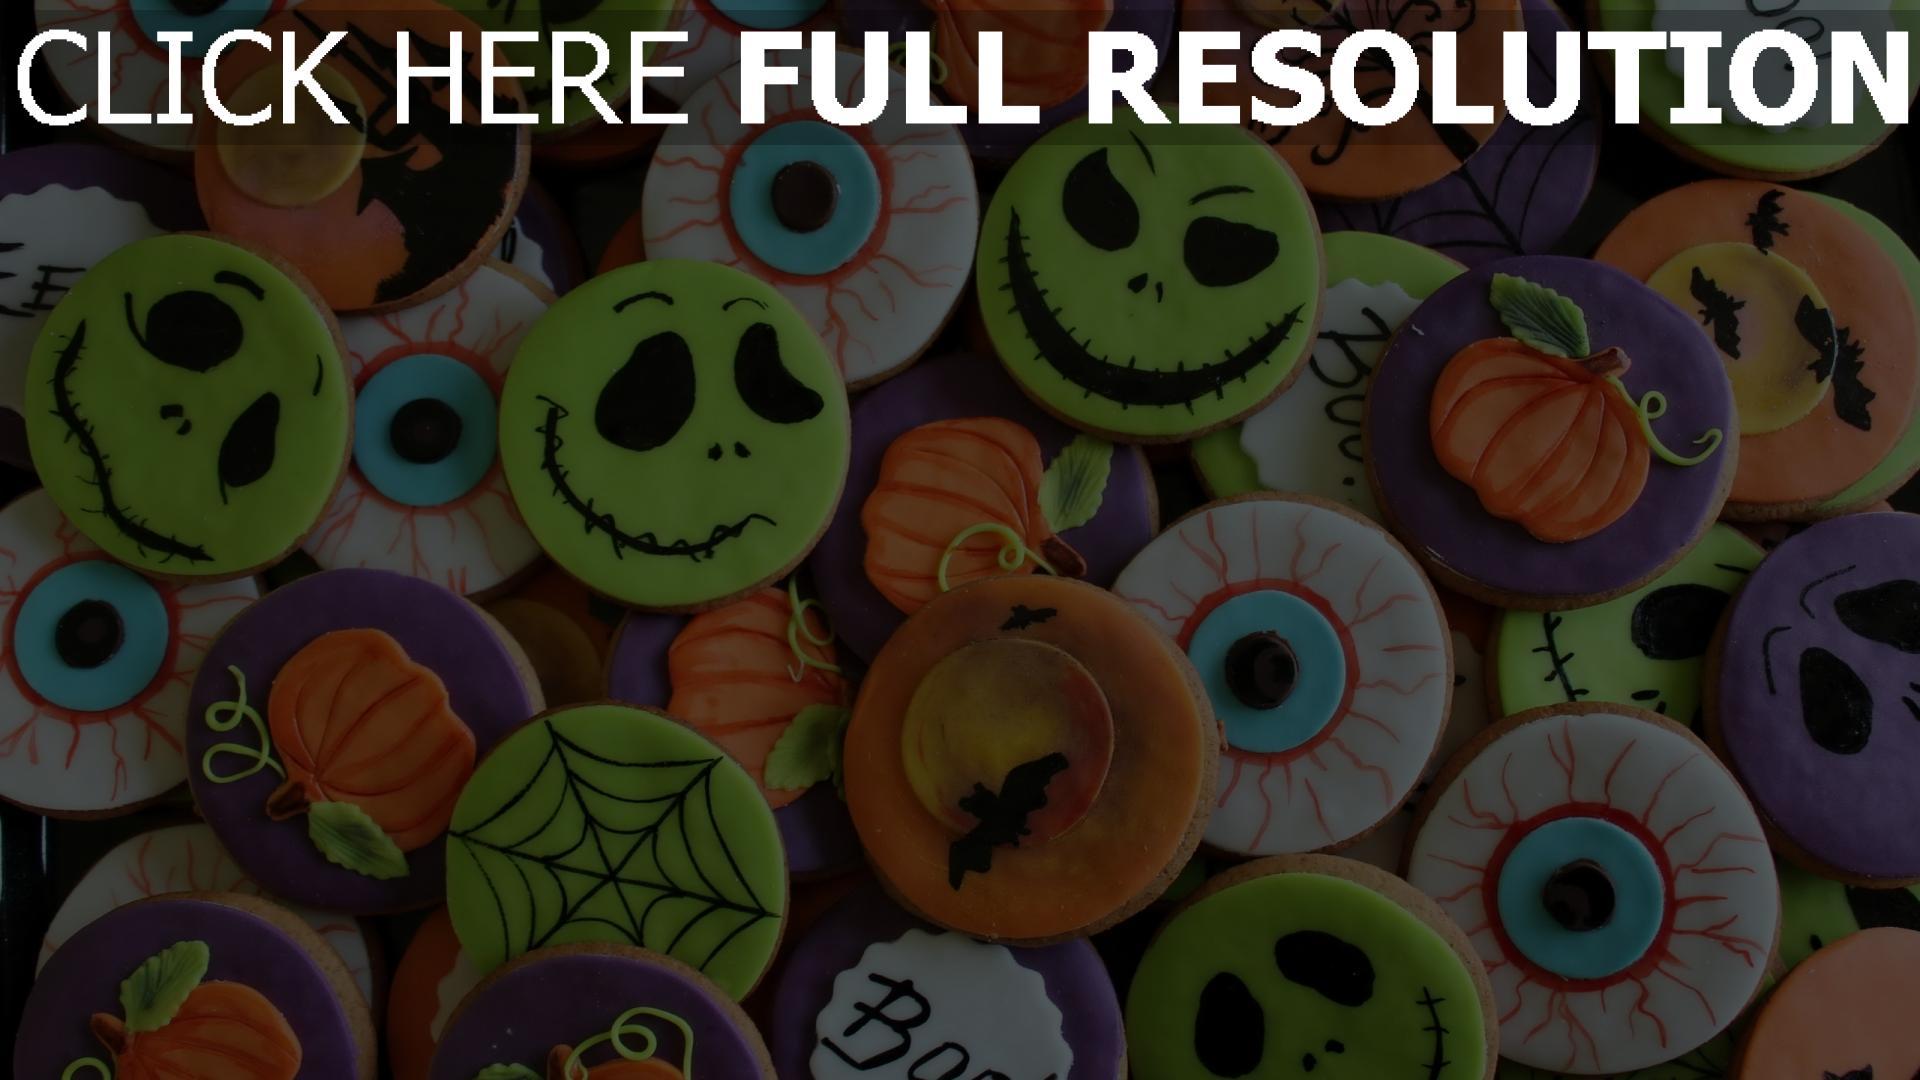 Halloween Christmas Decorations Funny